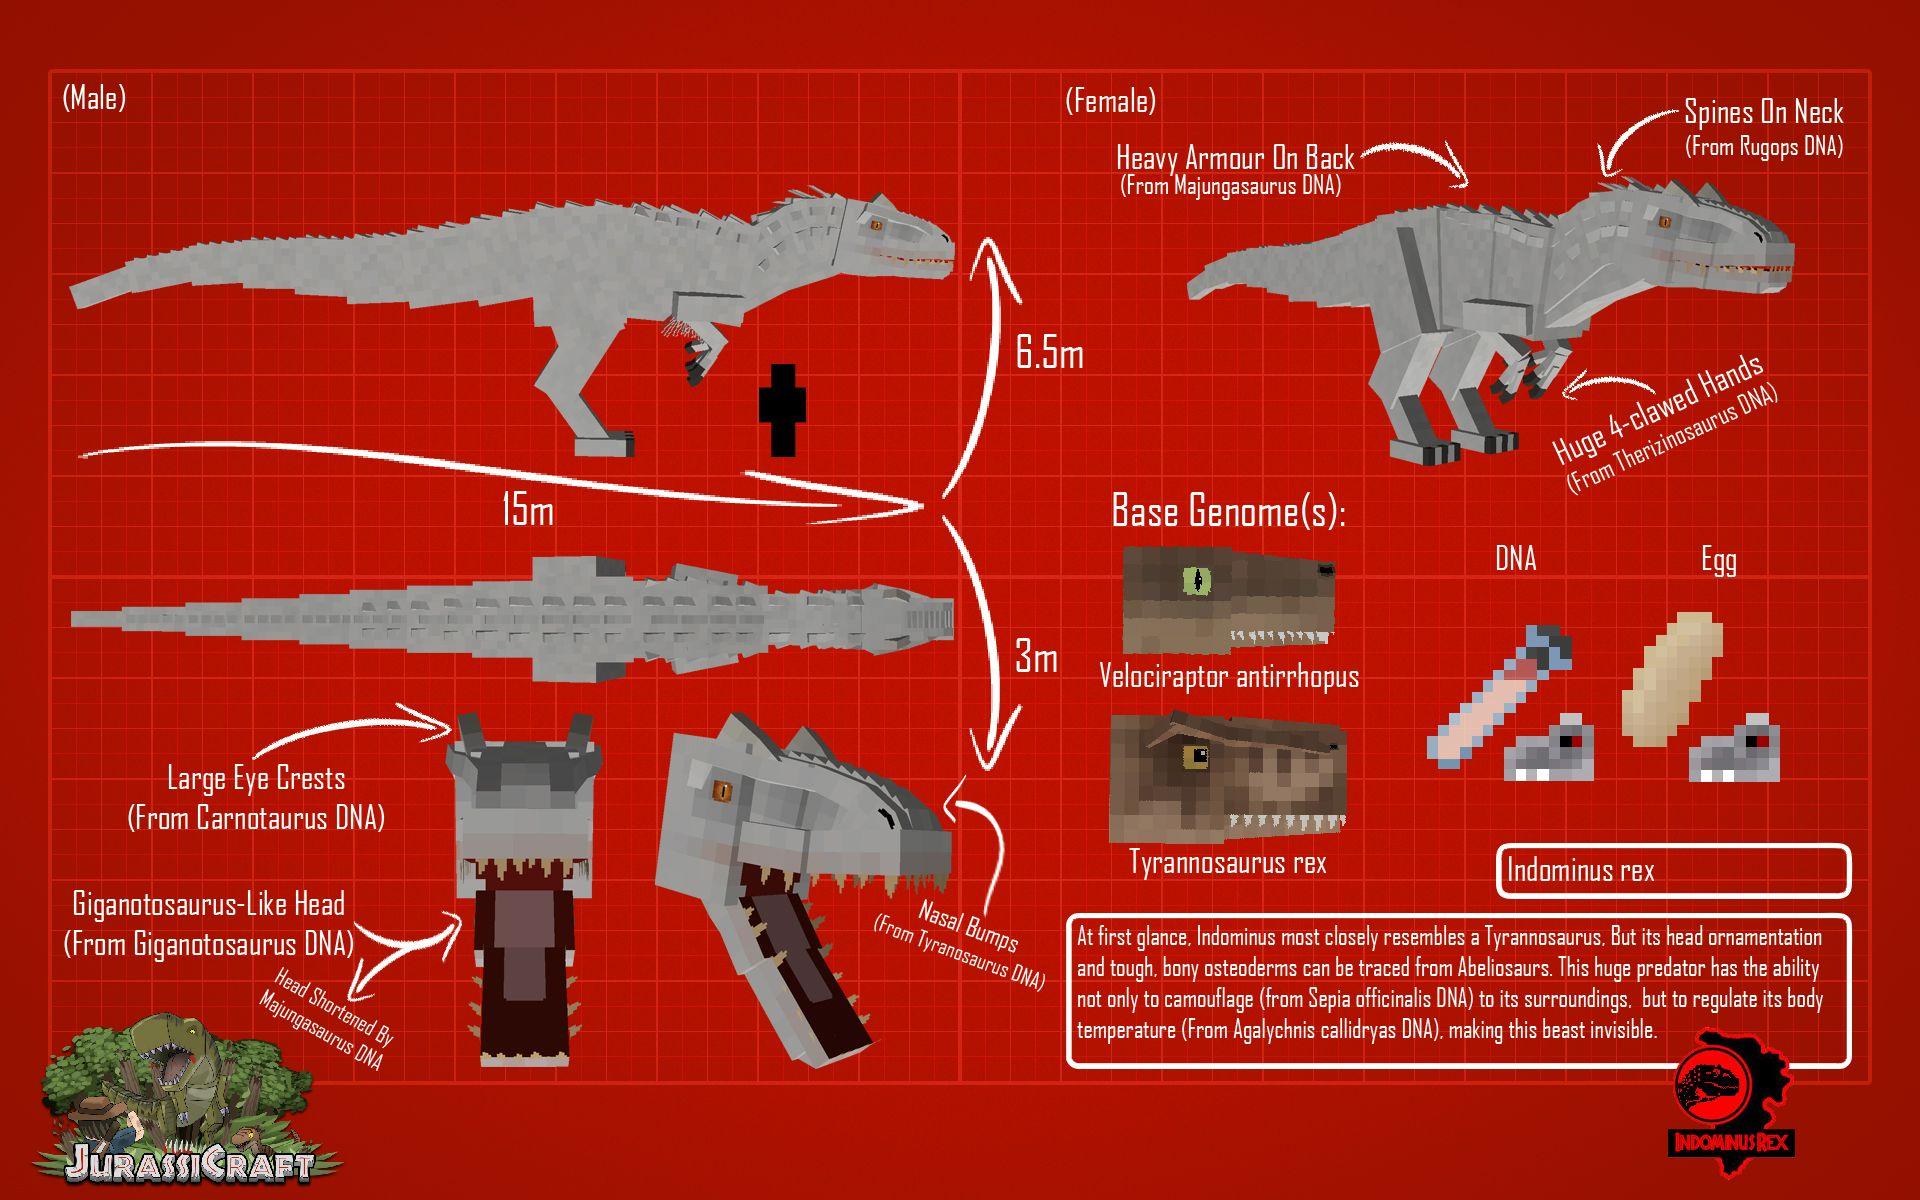 jurassicraft_hybrid____indominus_rex_by_jurassicraft-d8wzkyv